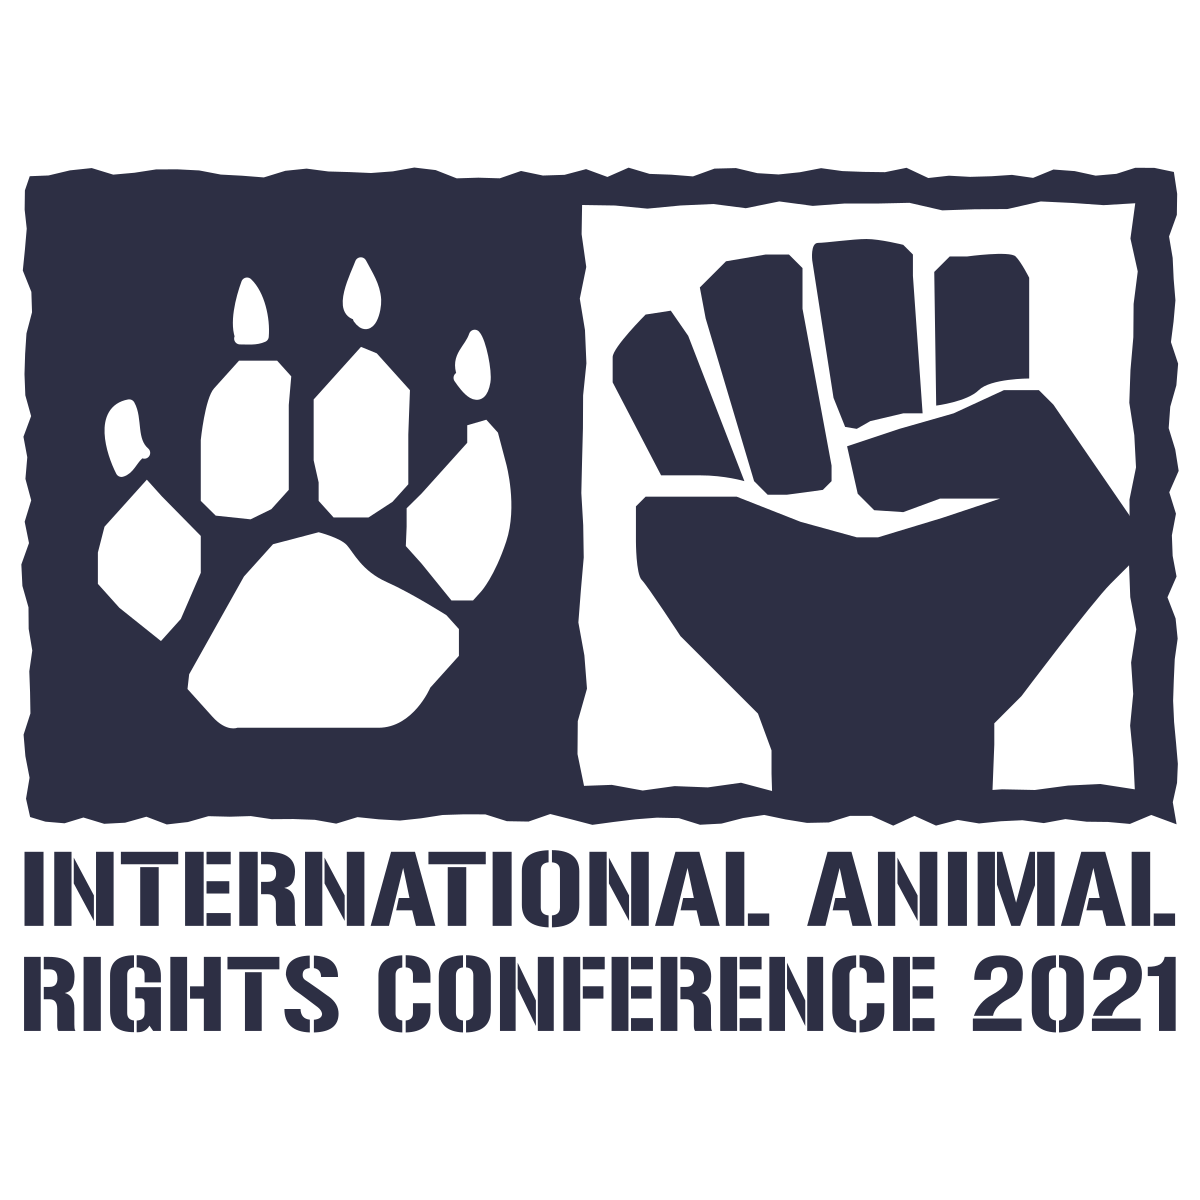 ARIWA-Infostand bei der International Animal Rights Conference 2021